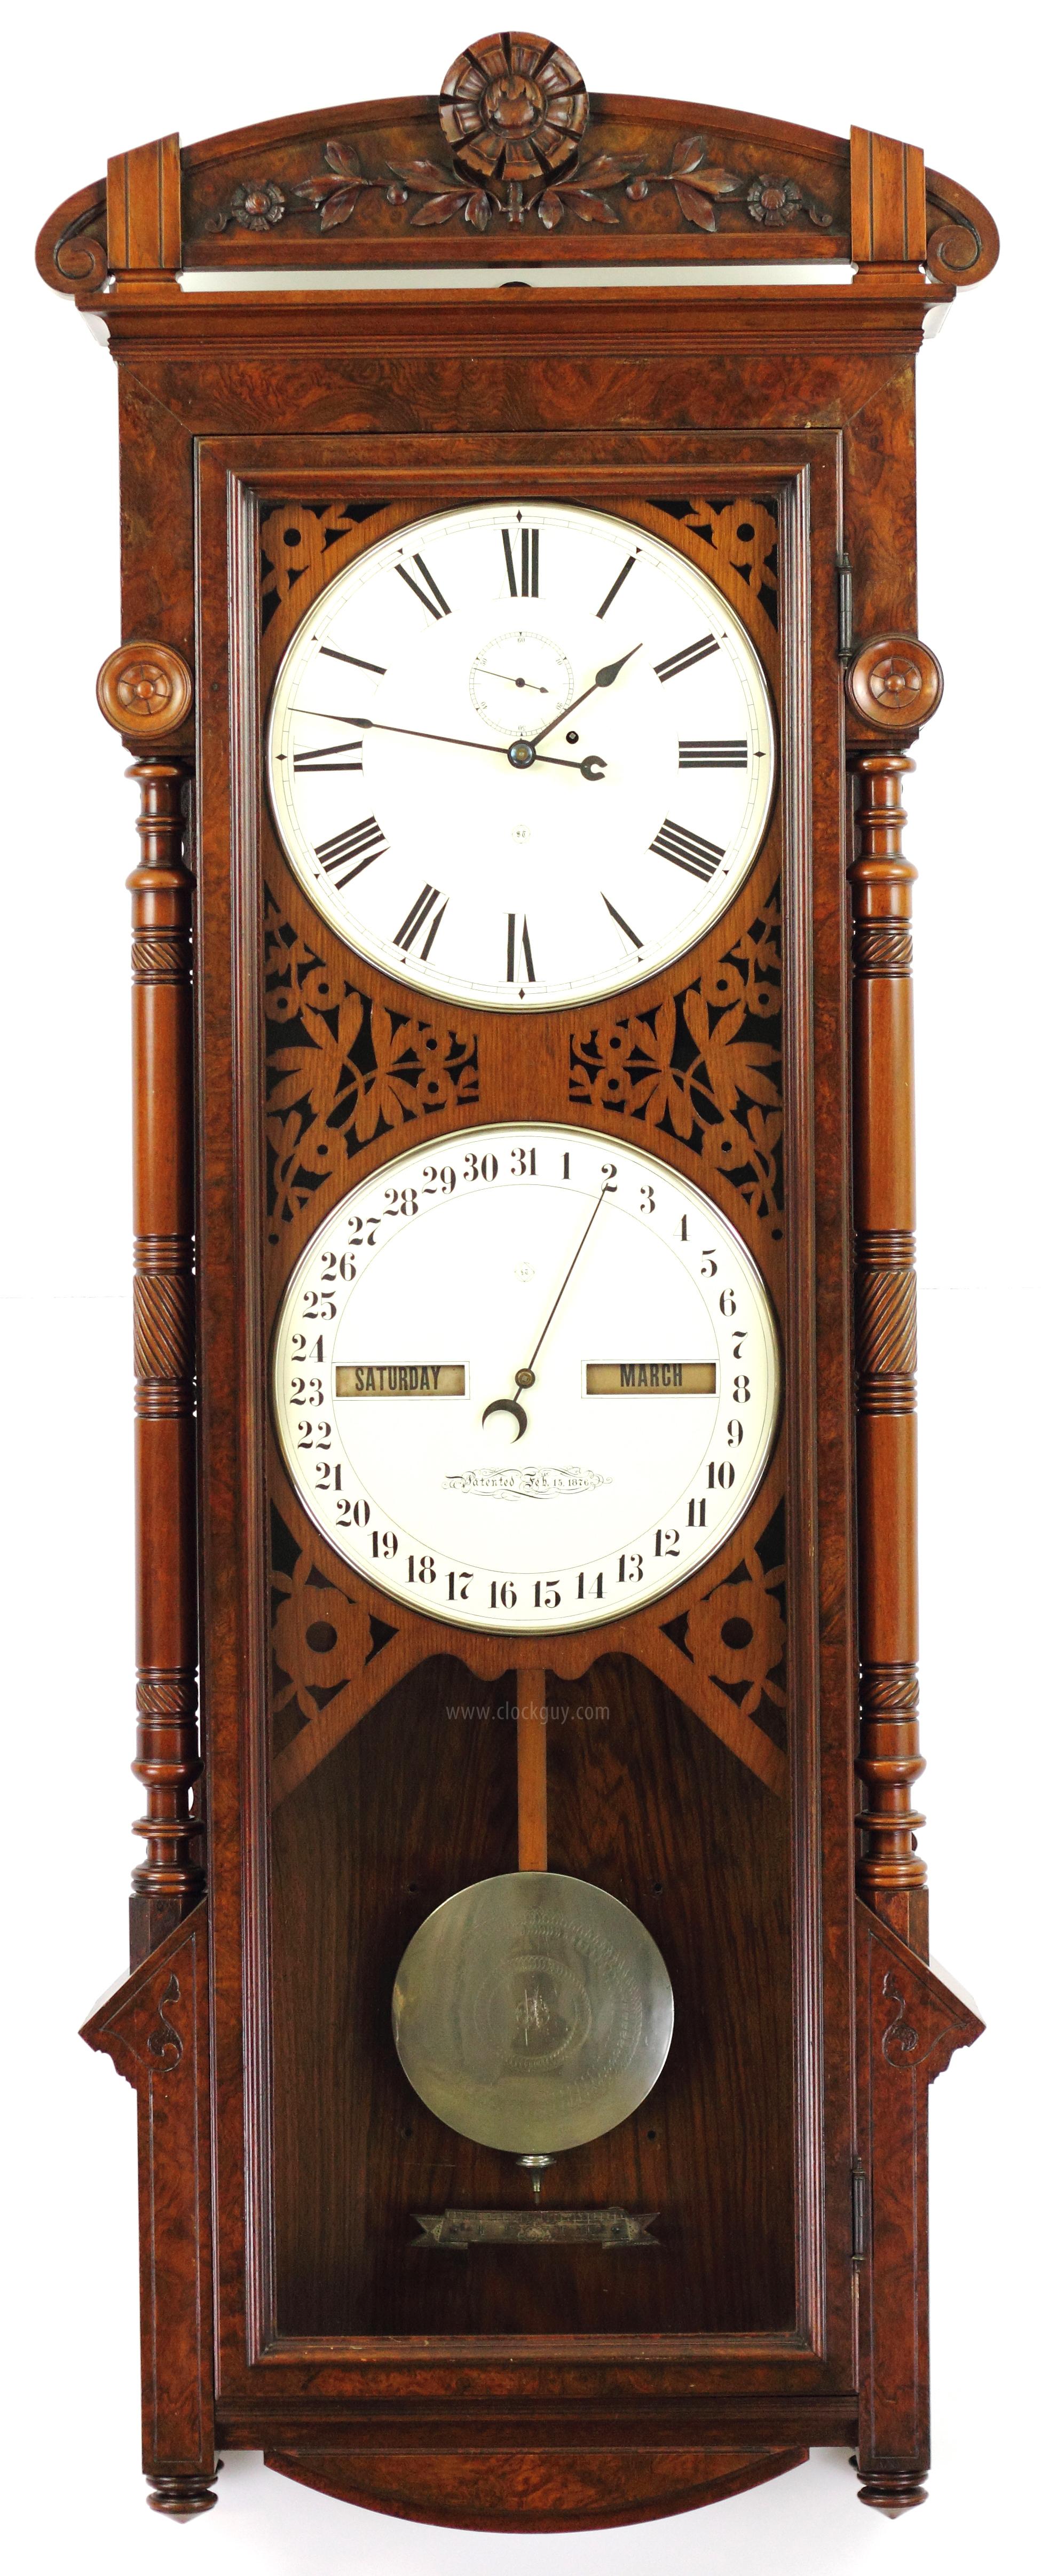 Dating seth thomas adamantine clocks